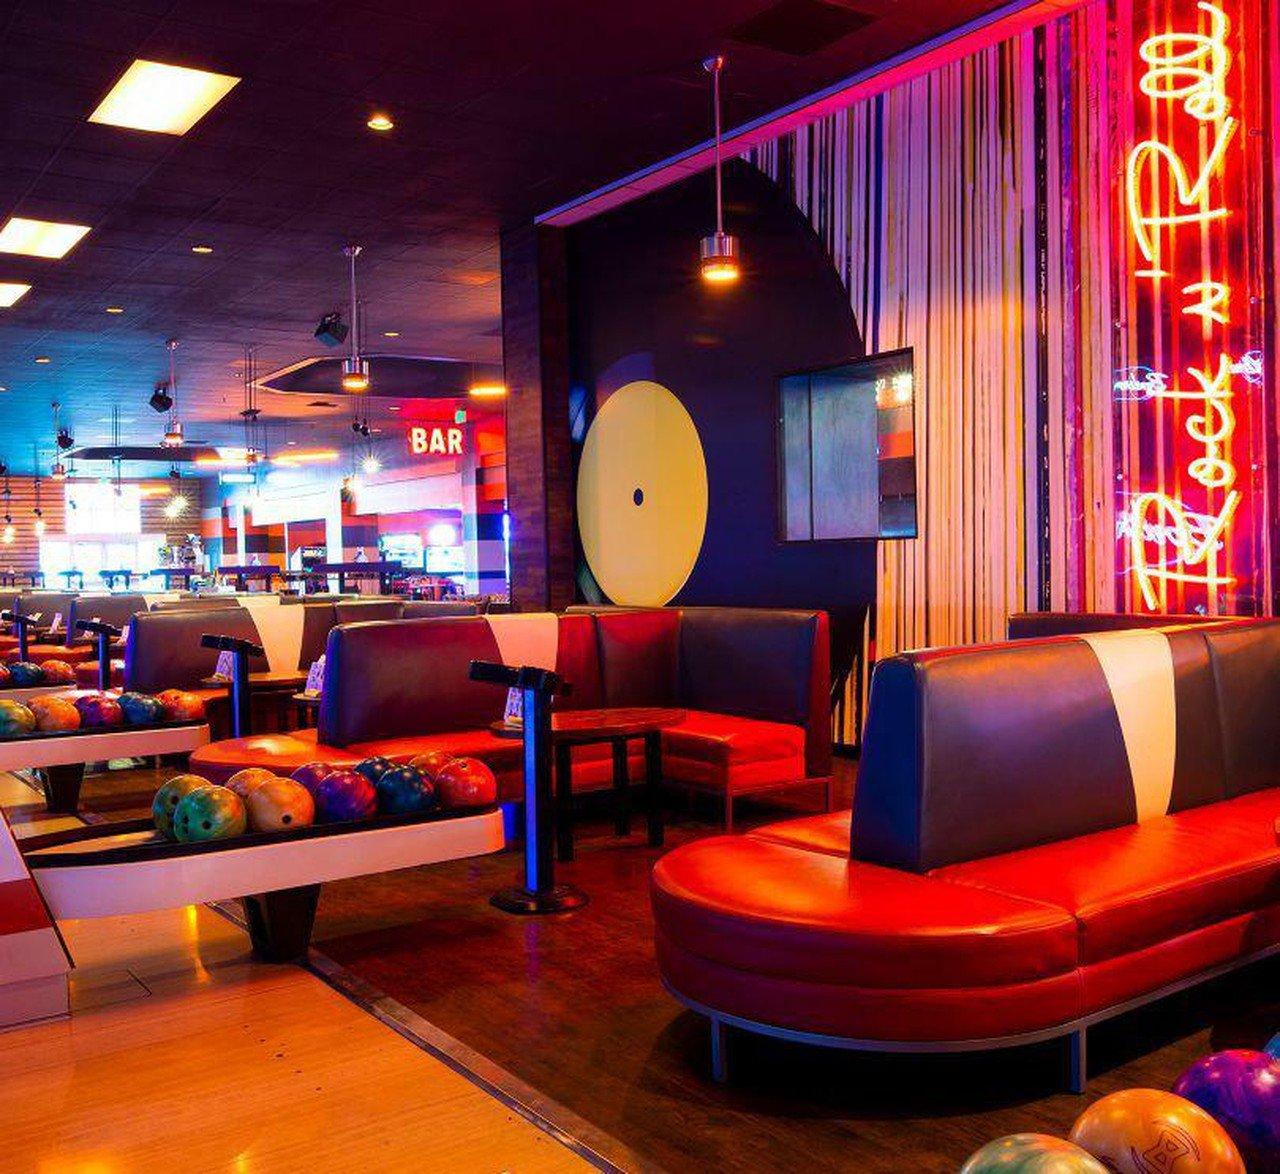 Rest der Welt corporate event venues Partyraum Bowlero Riverside Lanes 267 CA image 0